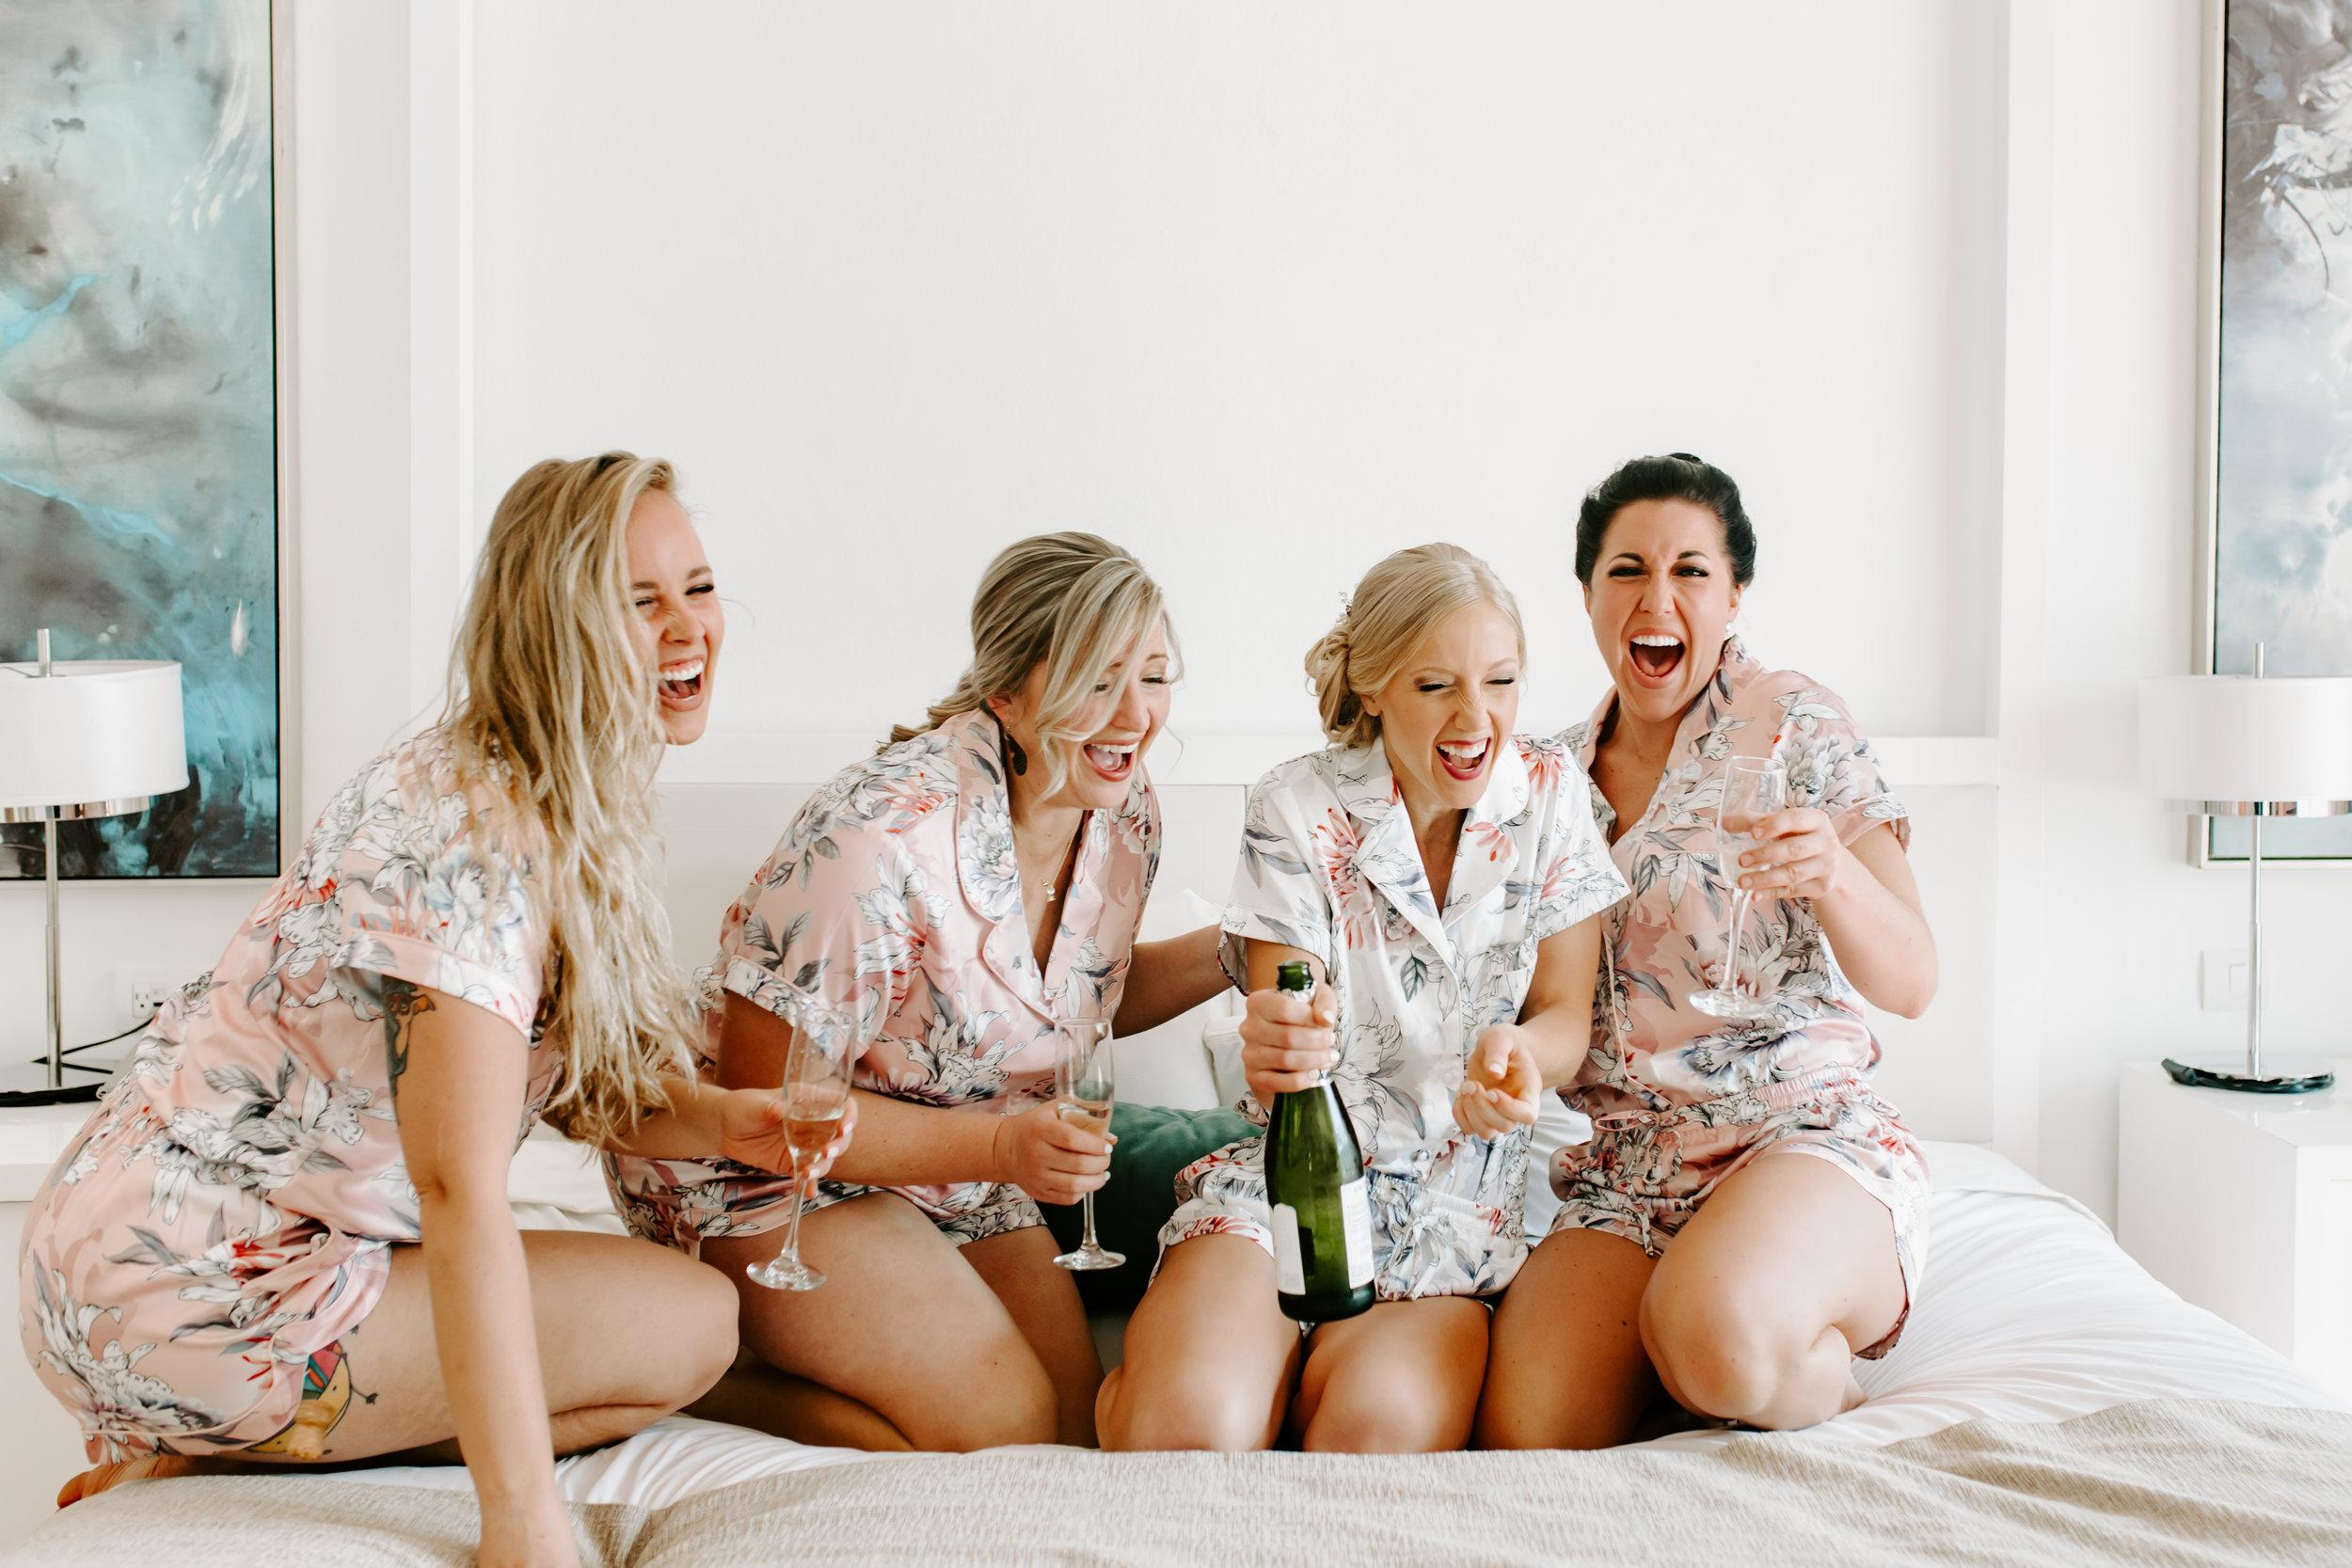 bridesmaids, wedding day, wedding photos, getting ready, floral pajamas, pajama sets, wedding pajamas, bride, define fettle